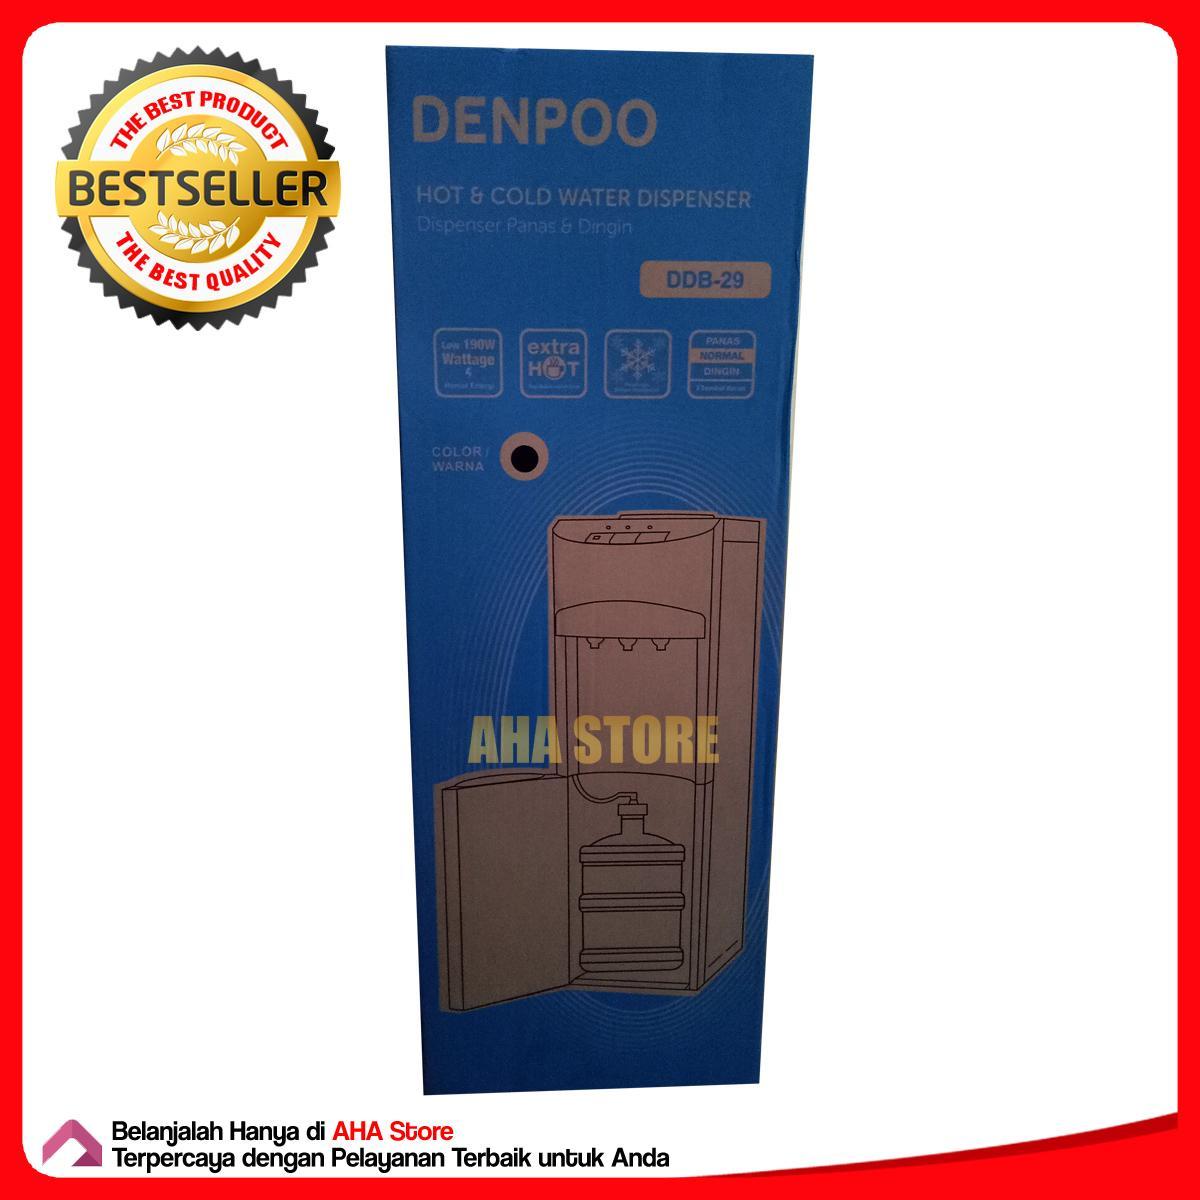 Denpoo Dispenser Air Standing Galon Bawah DDB 29 Hitam 5 .